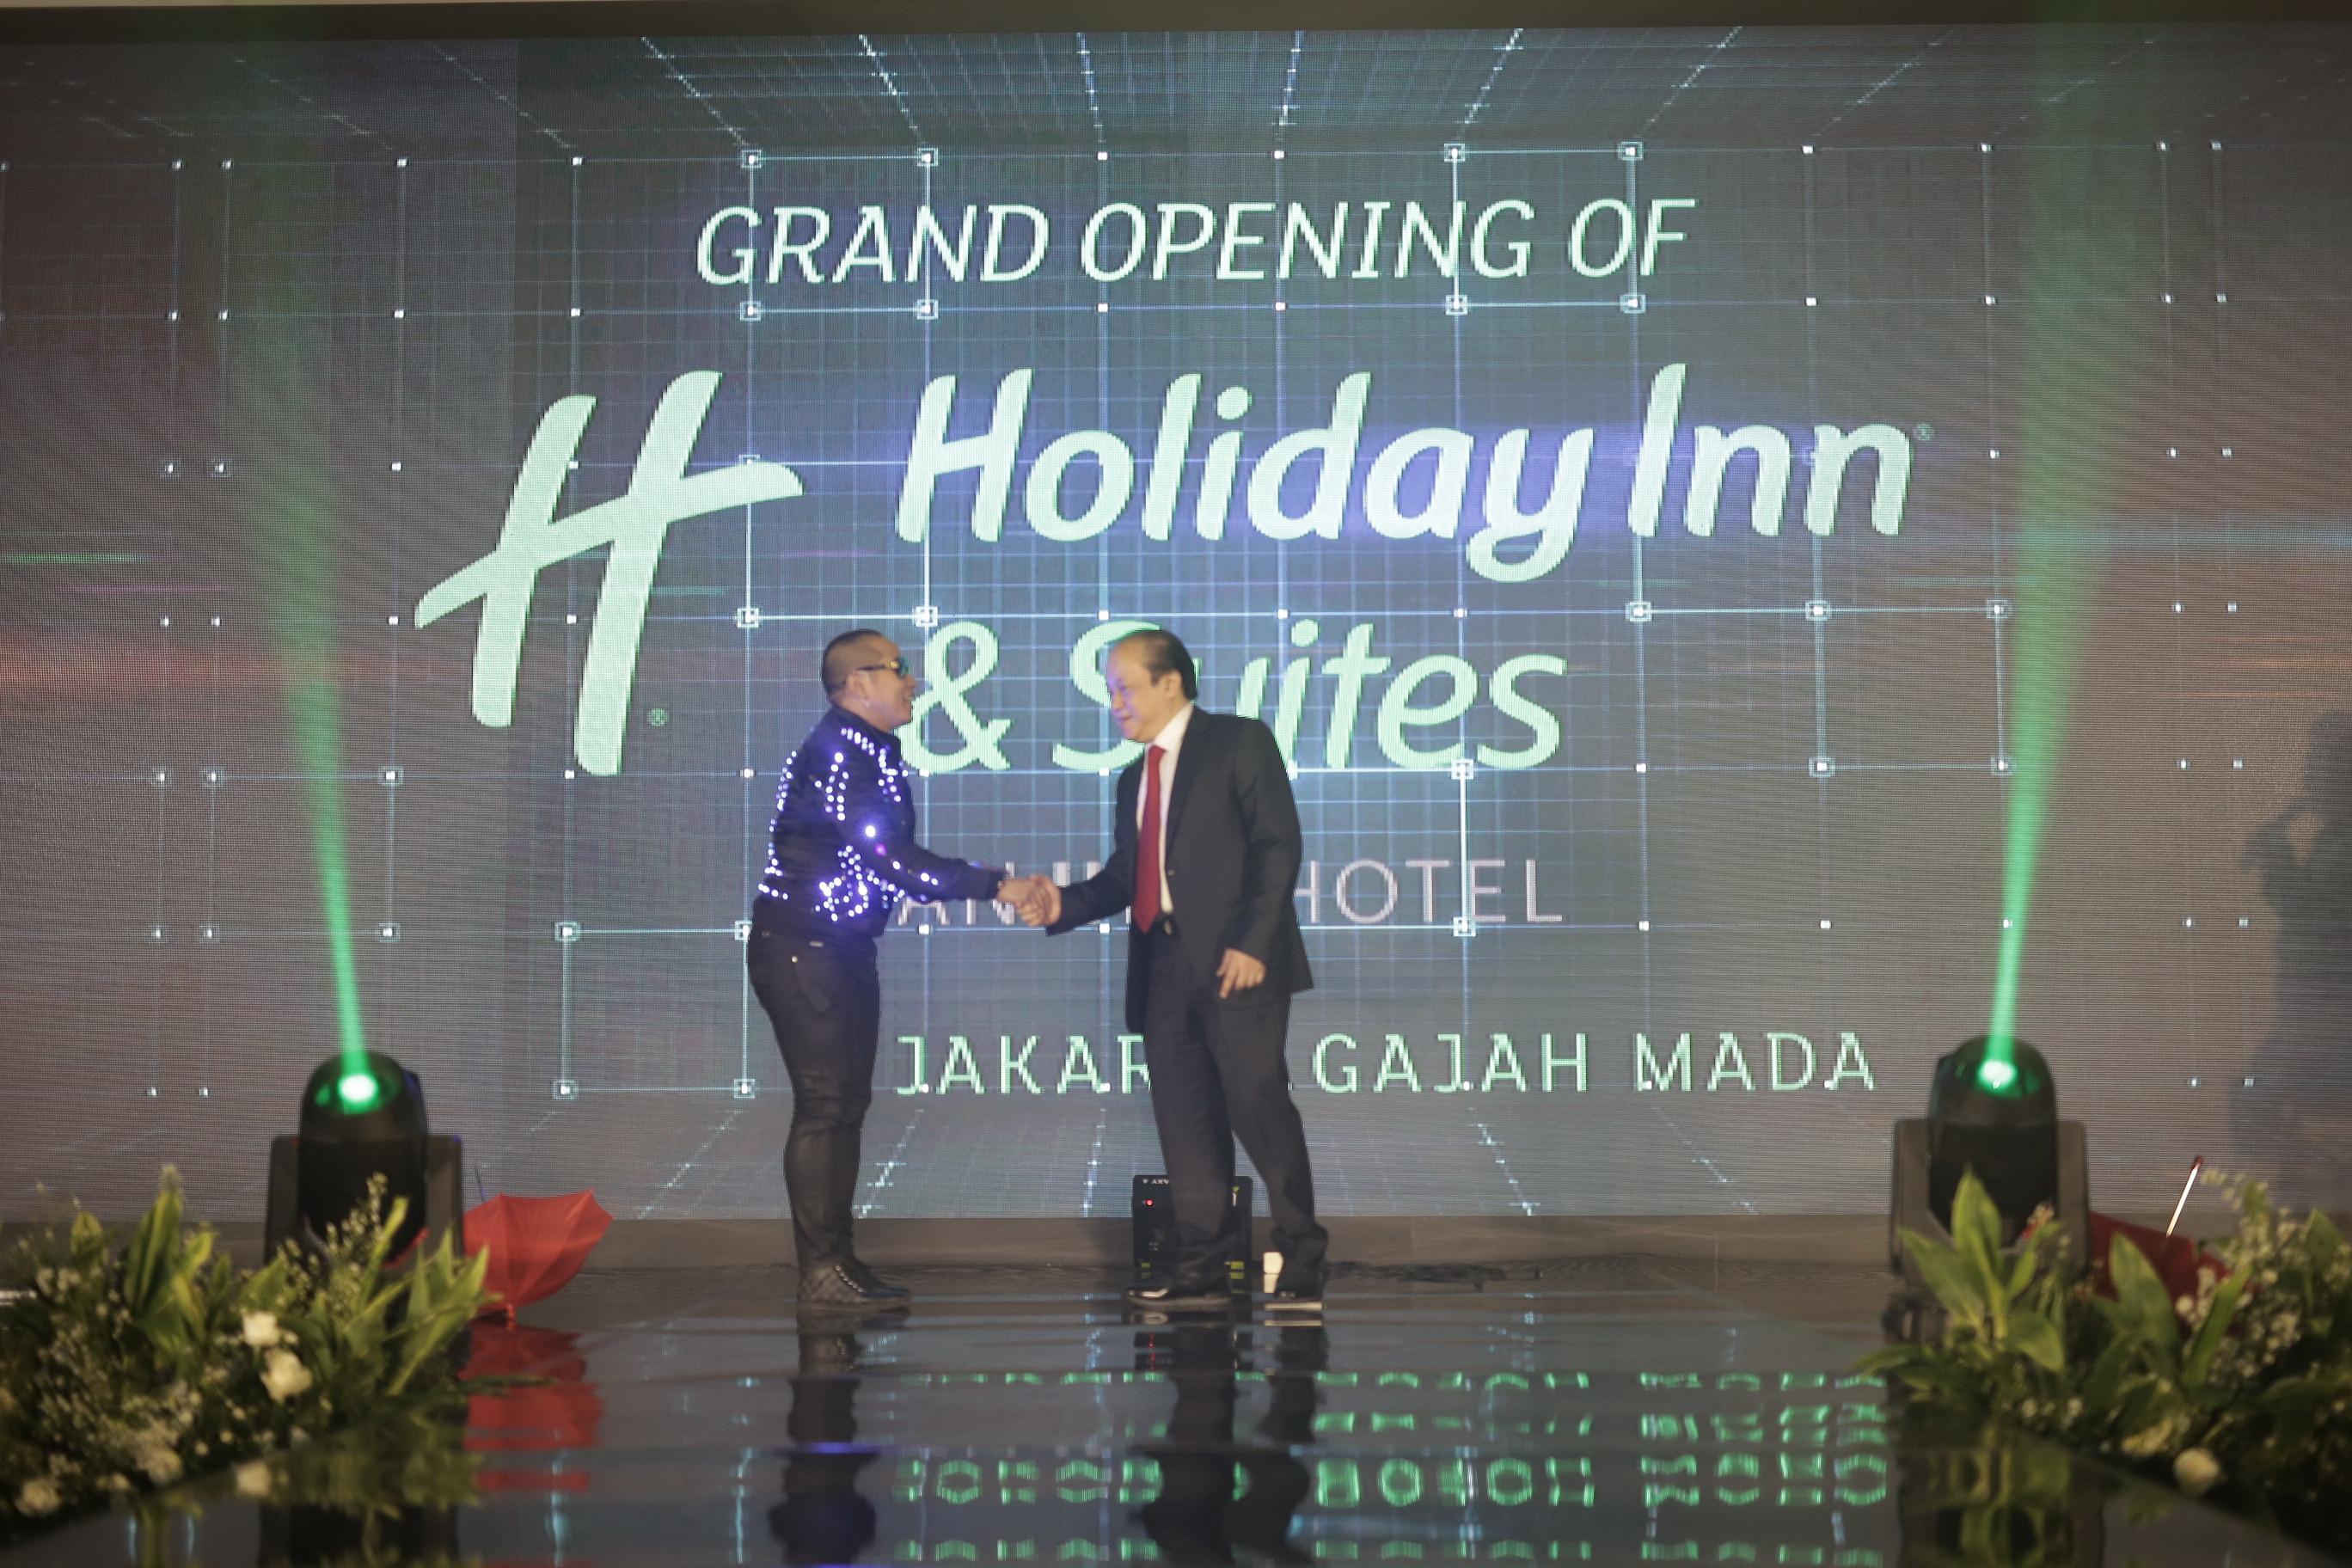 Grand Opening Holiday Inn & Suites Jakarta Gajah Mada